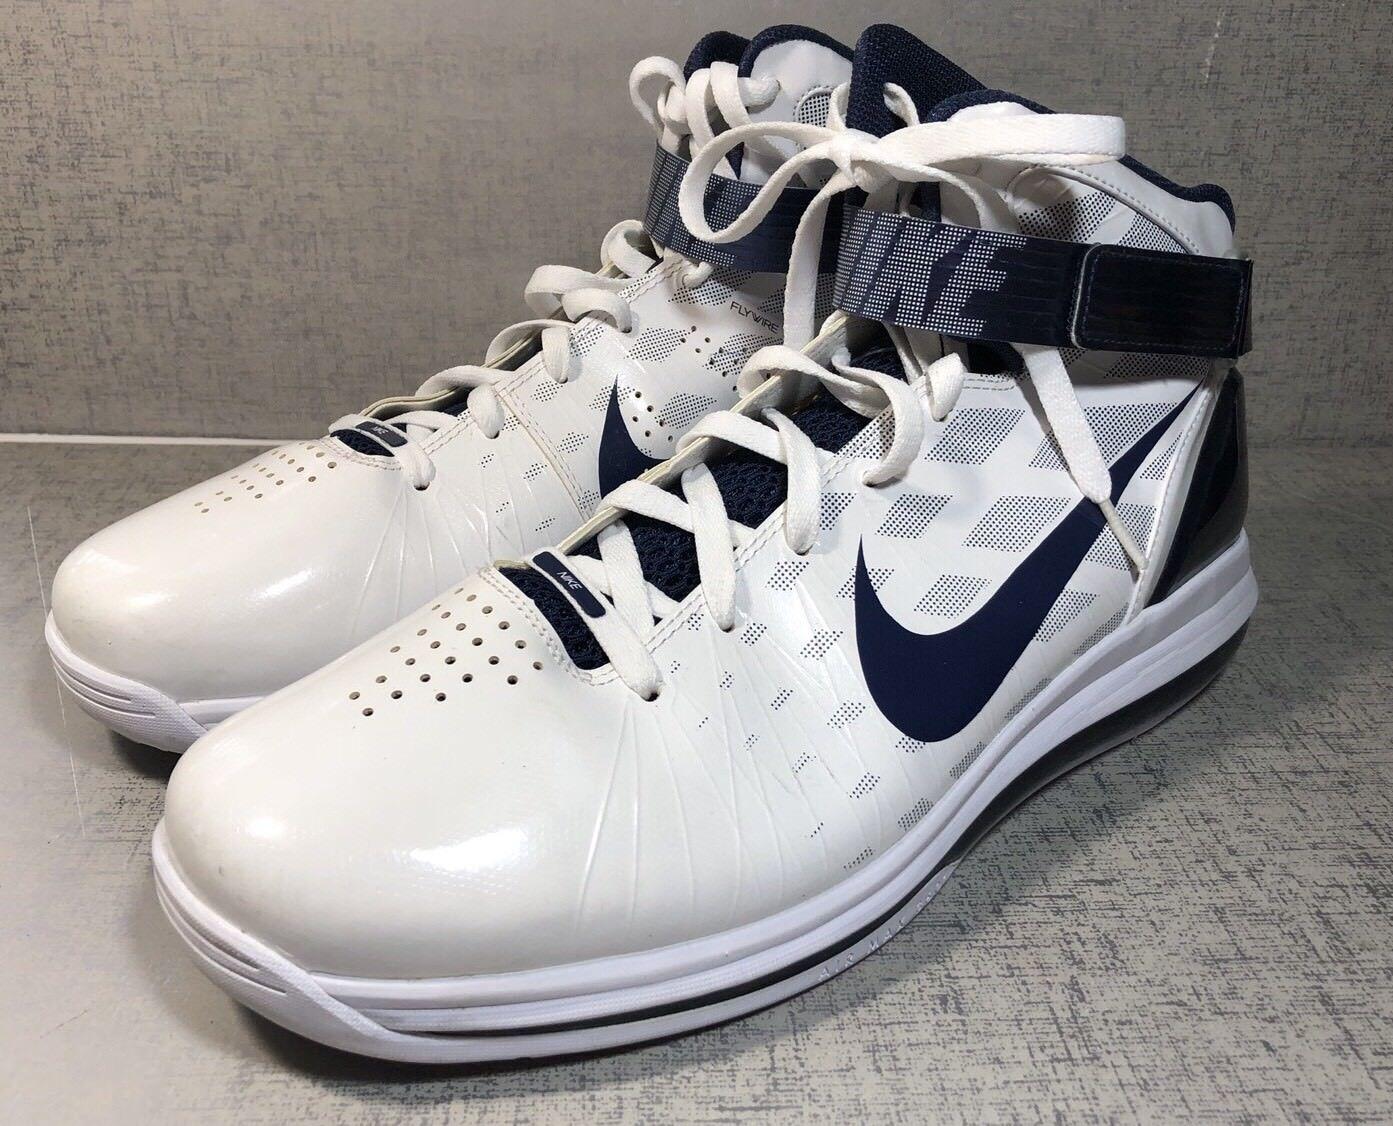 size 40 0c030 e72cb Nike zoom flywire hyperdunk bianco blu, scarpe da basket uomo uomo uomo  numero 14 94f453